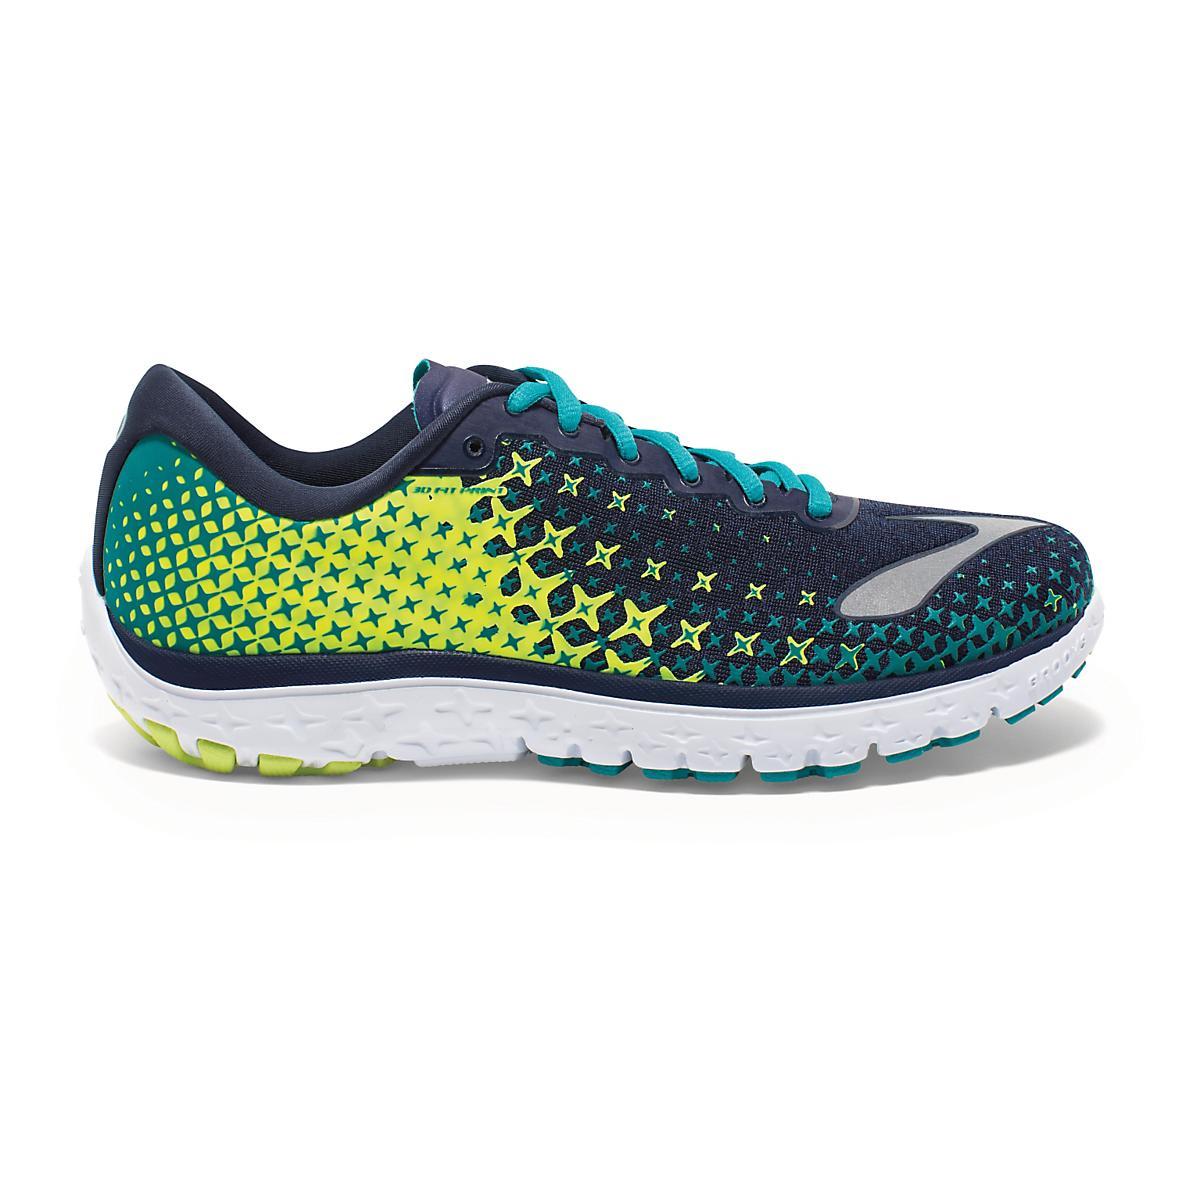 fd71168899b Womens Brooks PureFlow 5 Running Shoe at Road Runner Sports